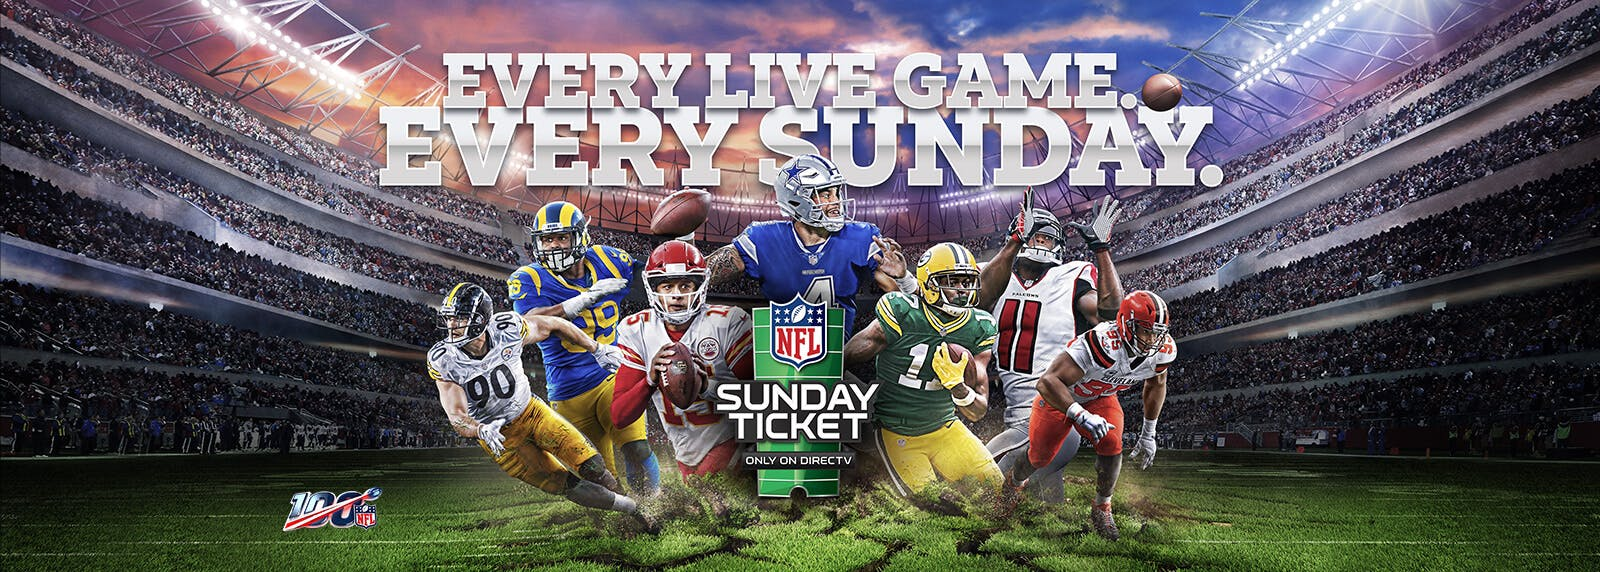 watch saints vs buccaneers live stream on nfl sunday ticket